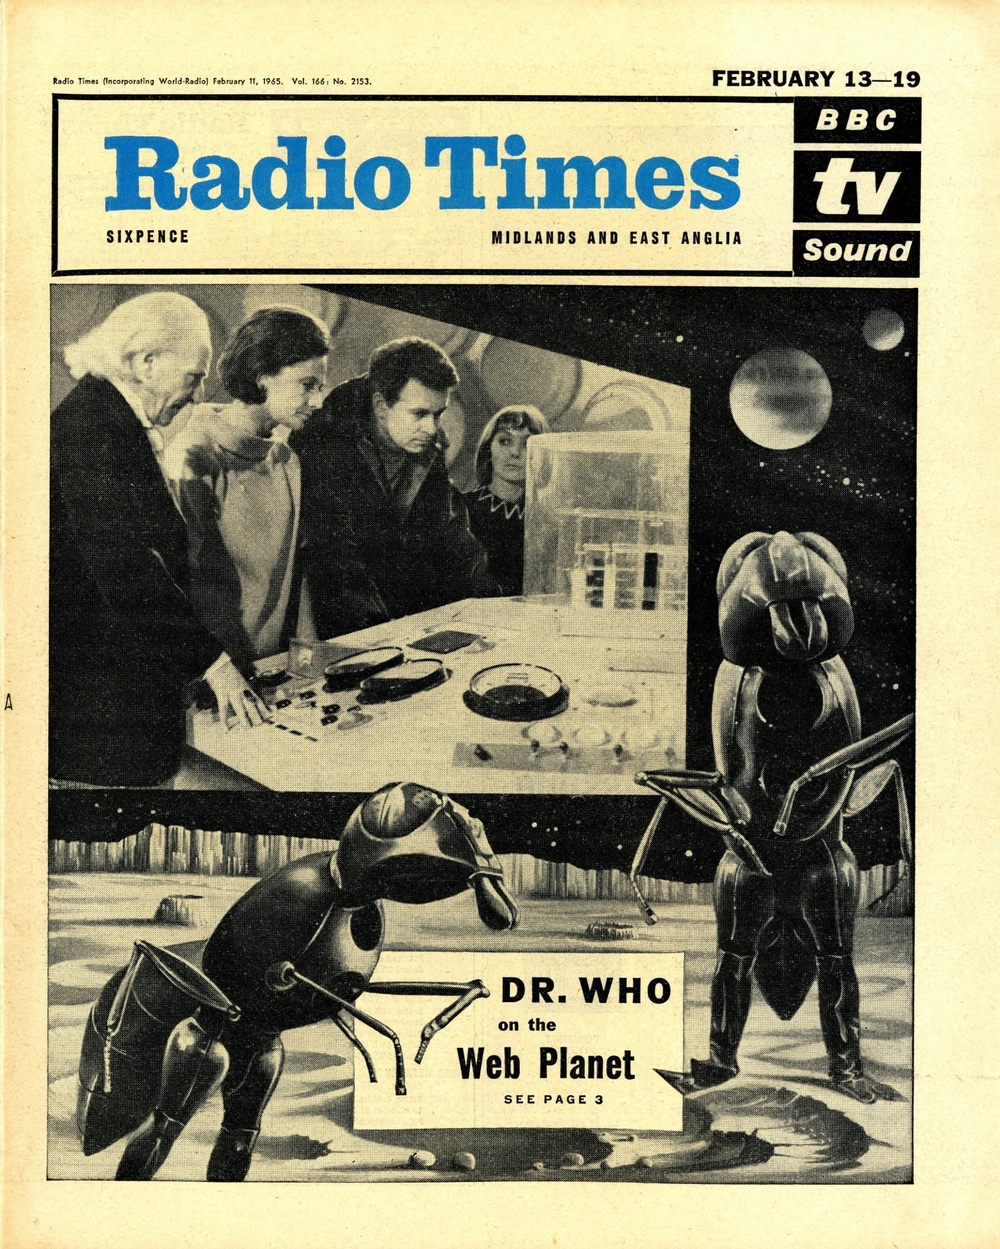 Radio Times, February 13-19, 1965